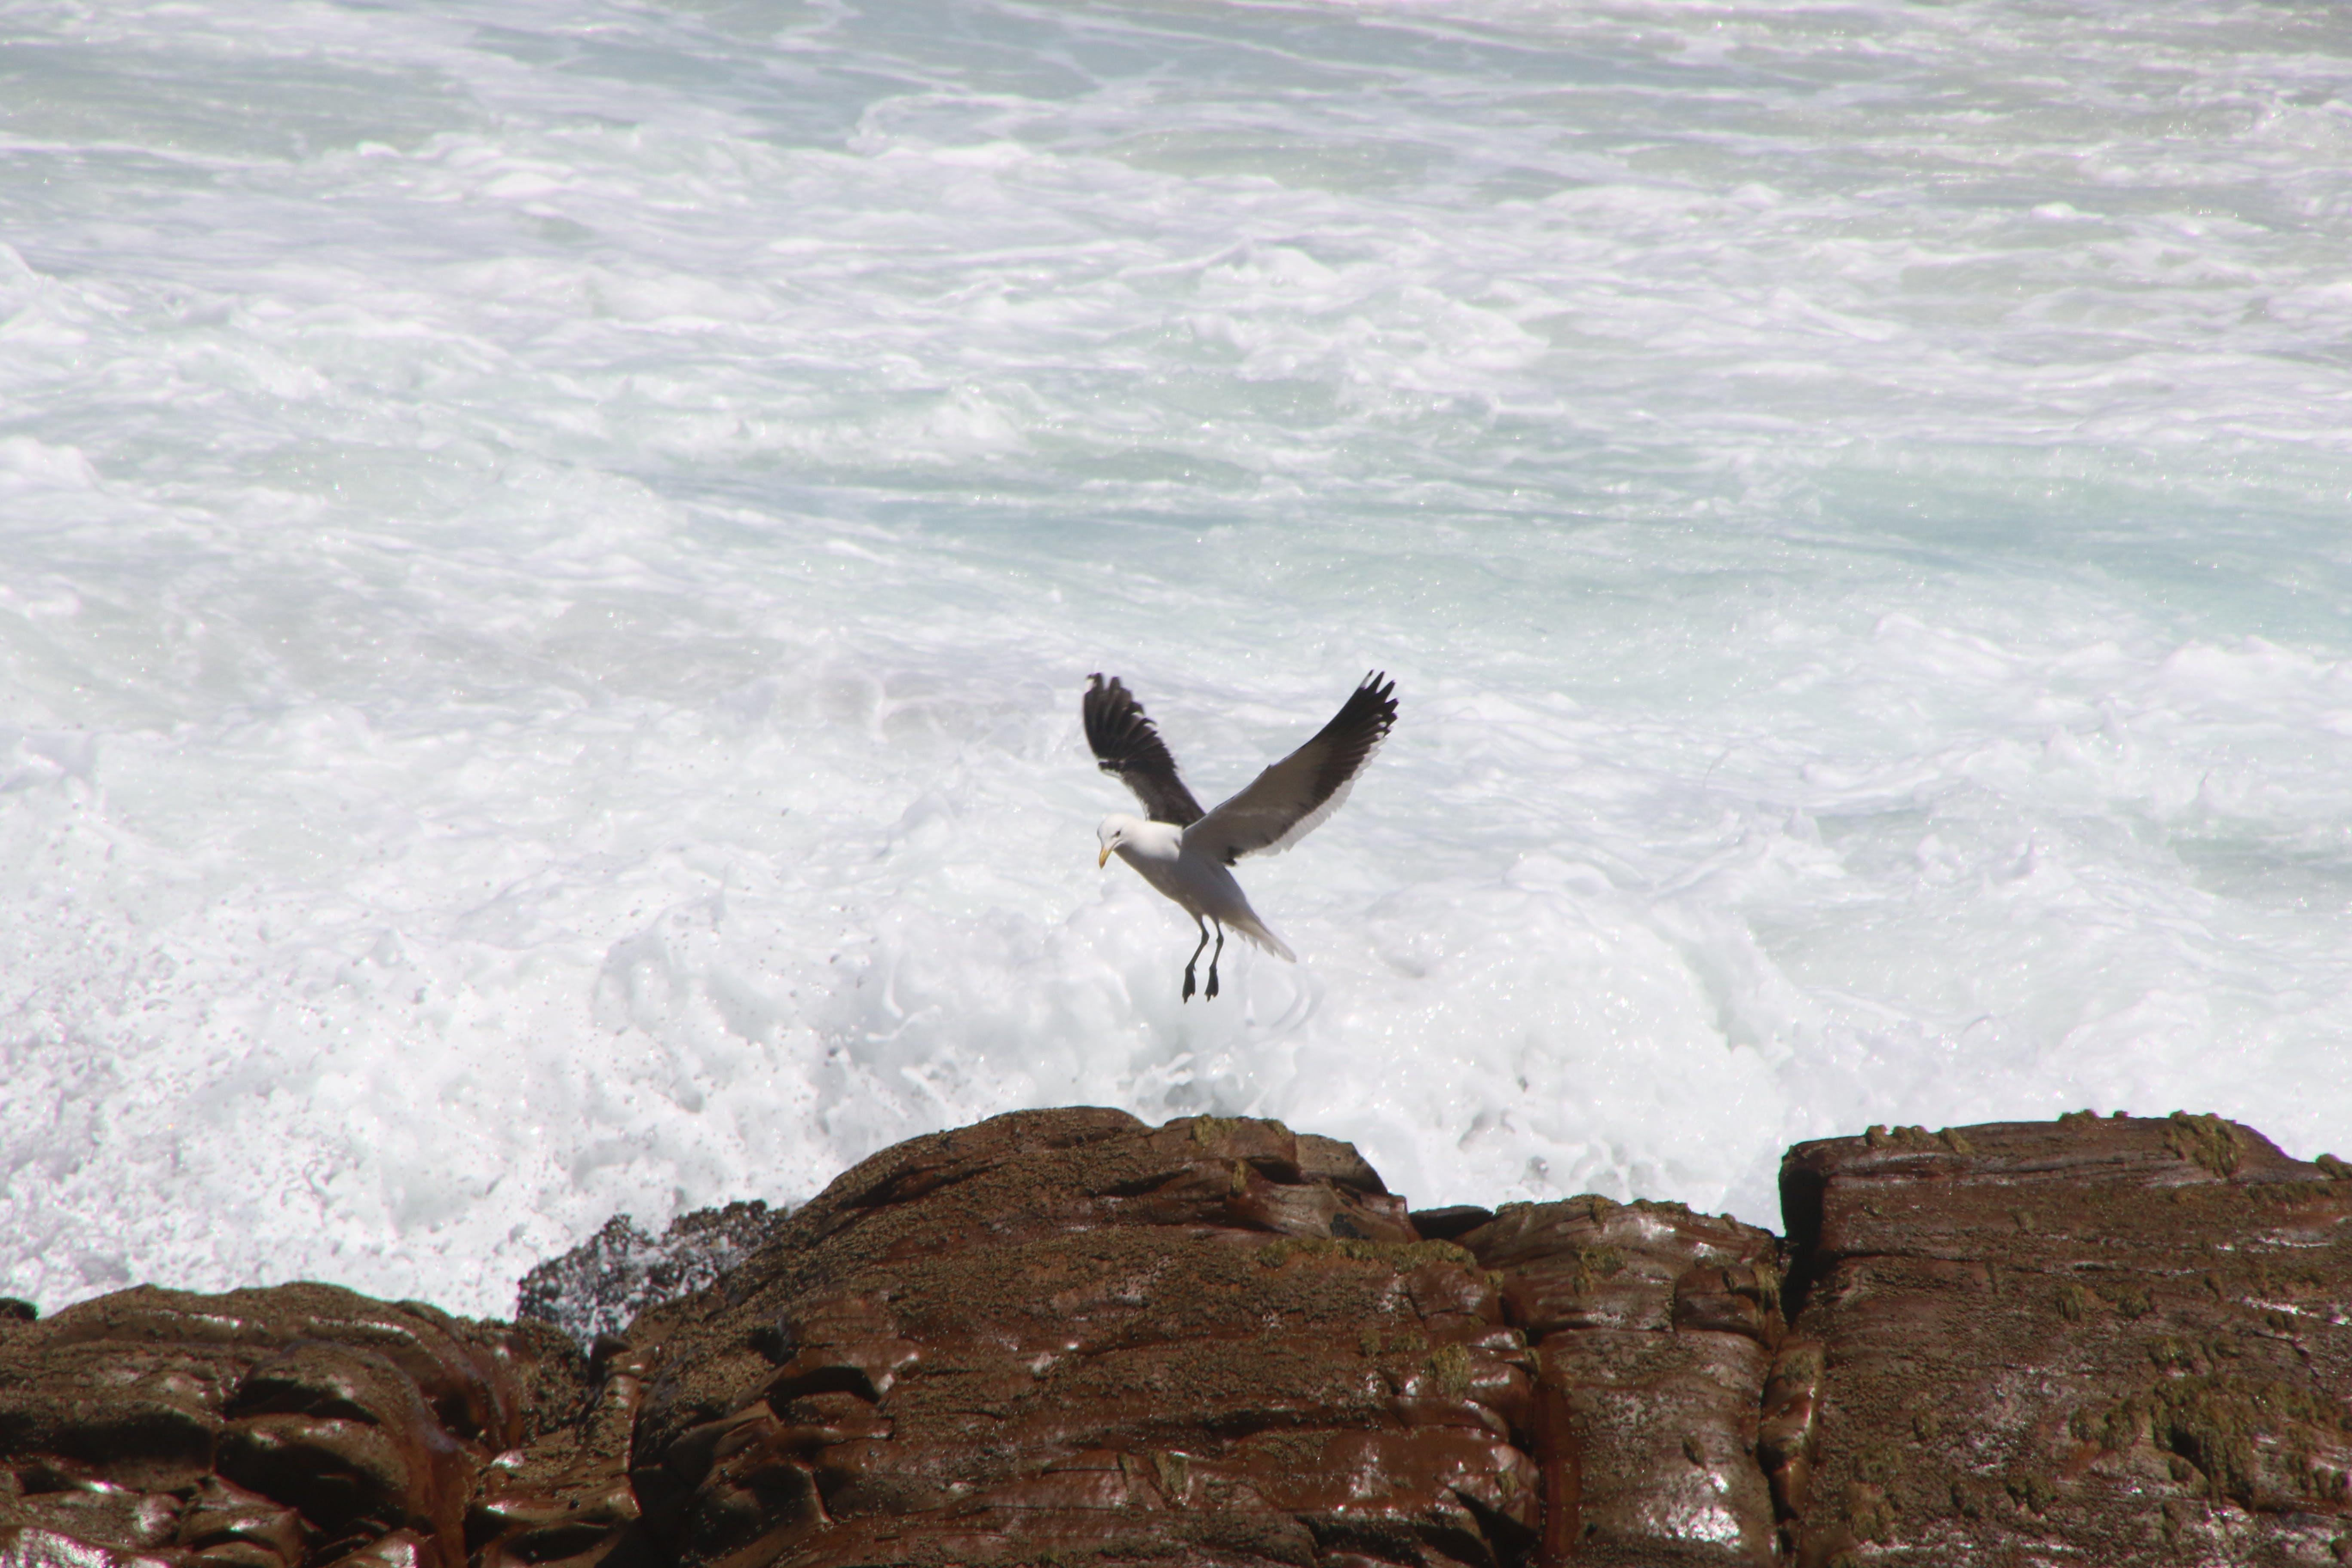 White Albatros Flying over Body of Water